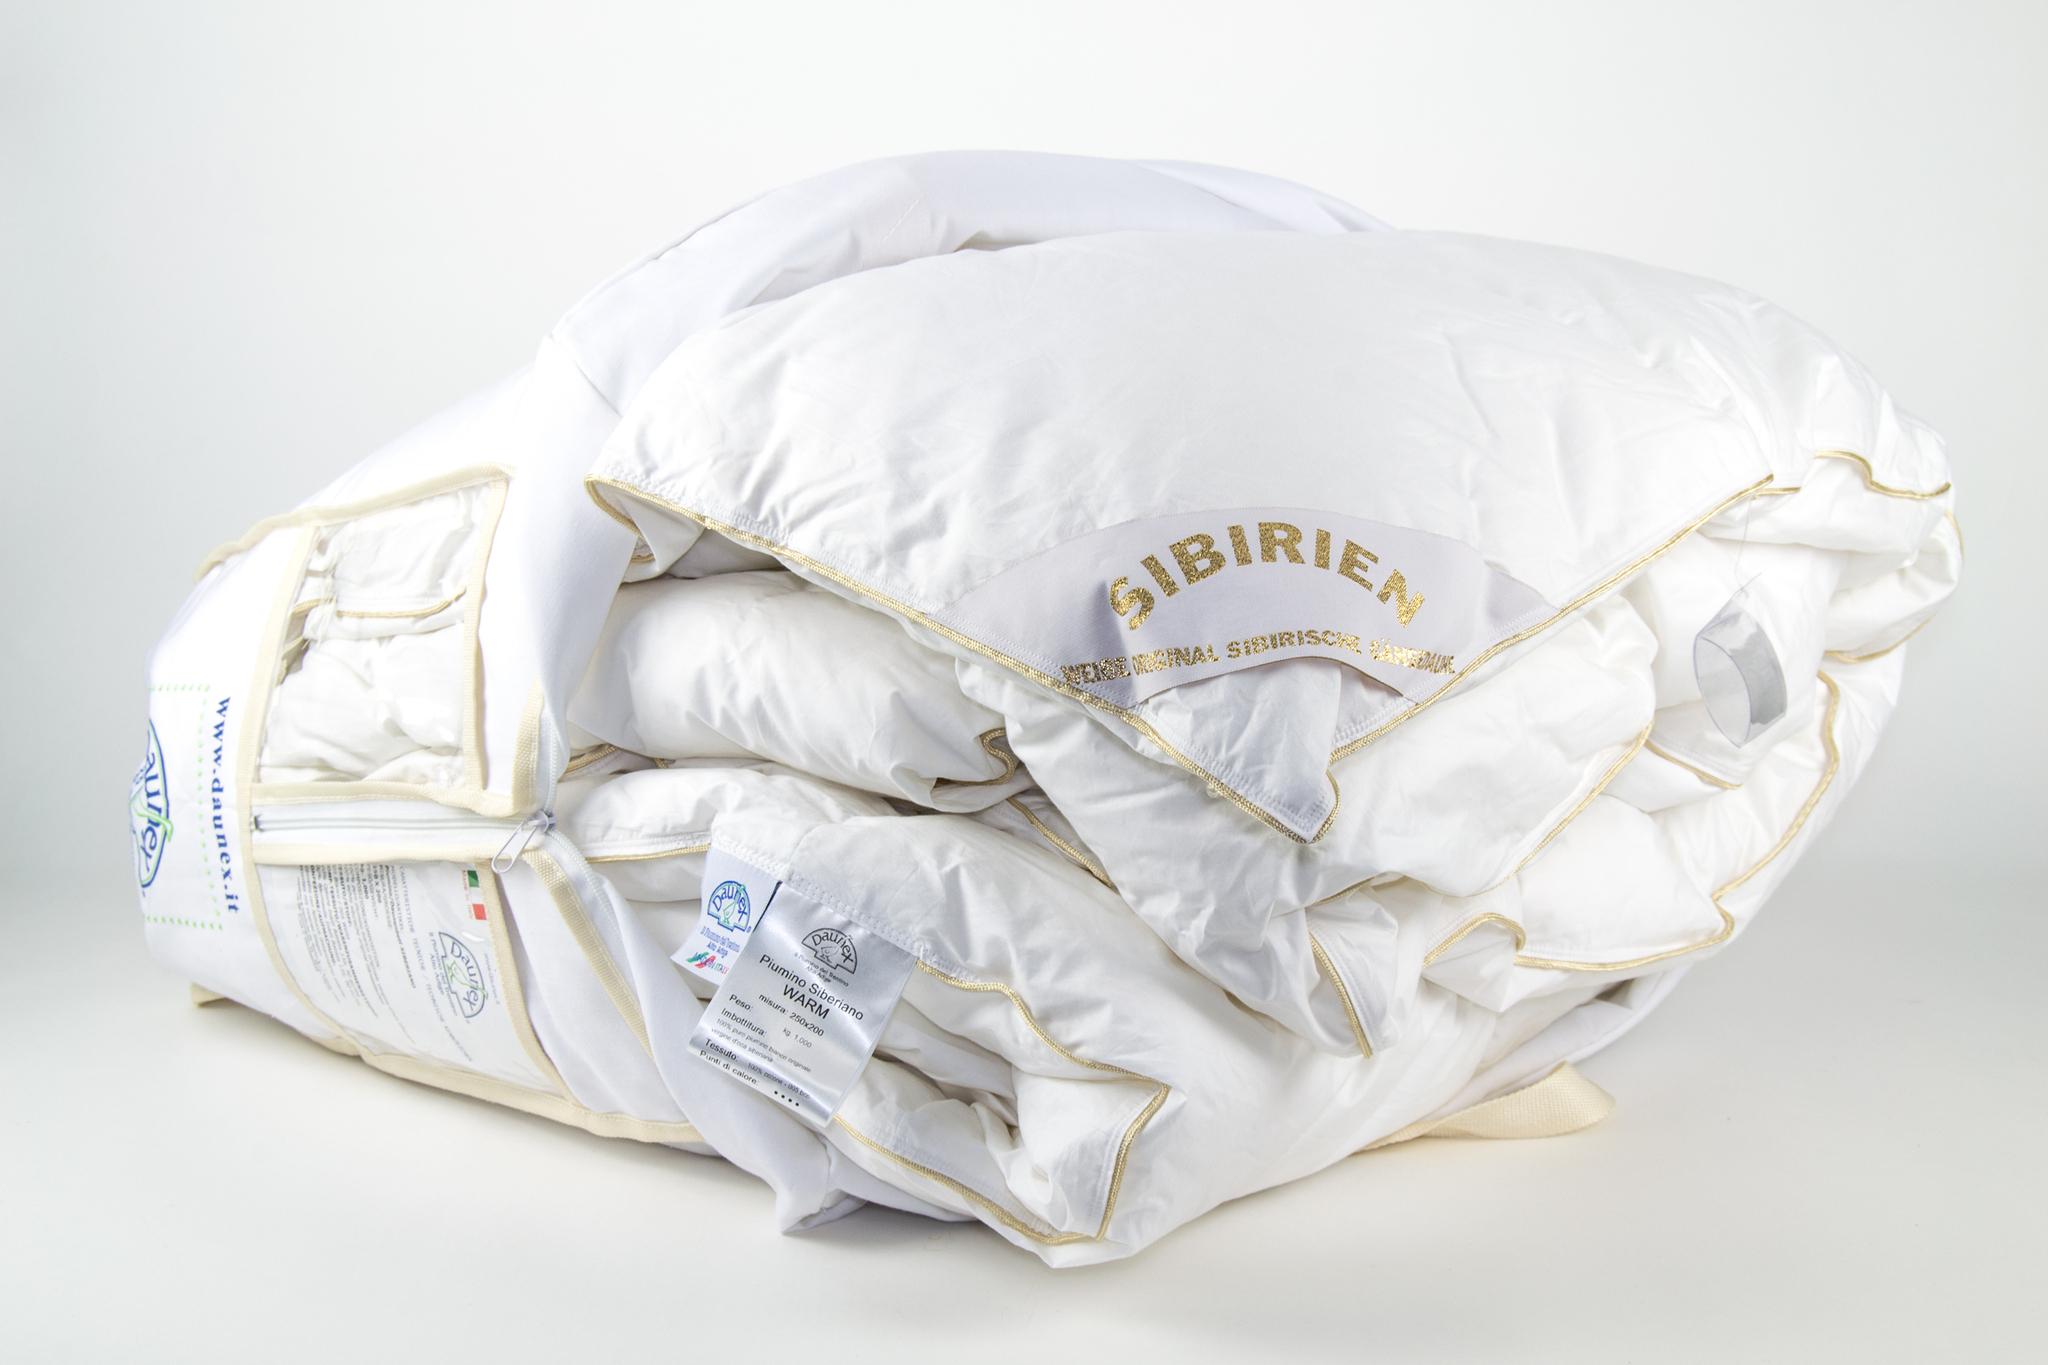 Одеяла Элитное одеяло пуховое 155х200 Siberiano от Daunex elitnoe-odeyalo-puhovoe-155h200-siberiano-ot-daunex.jpg